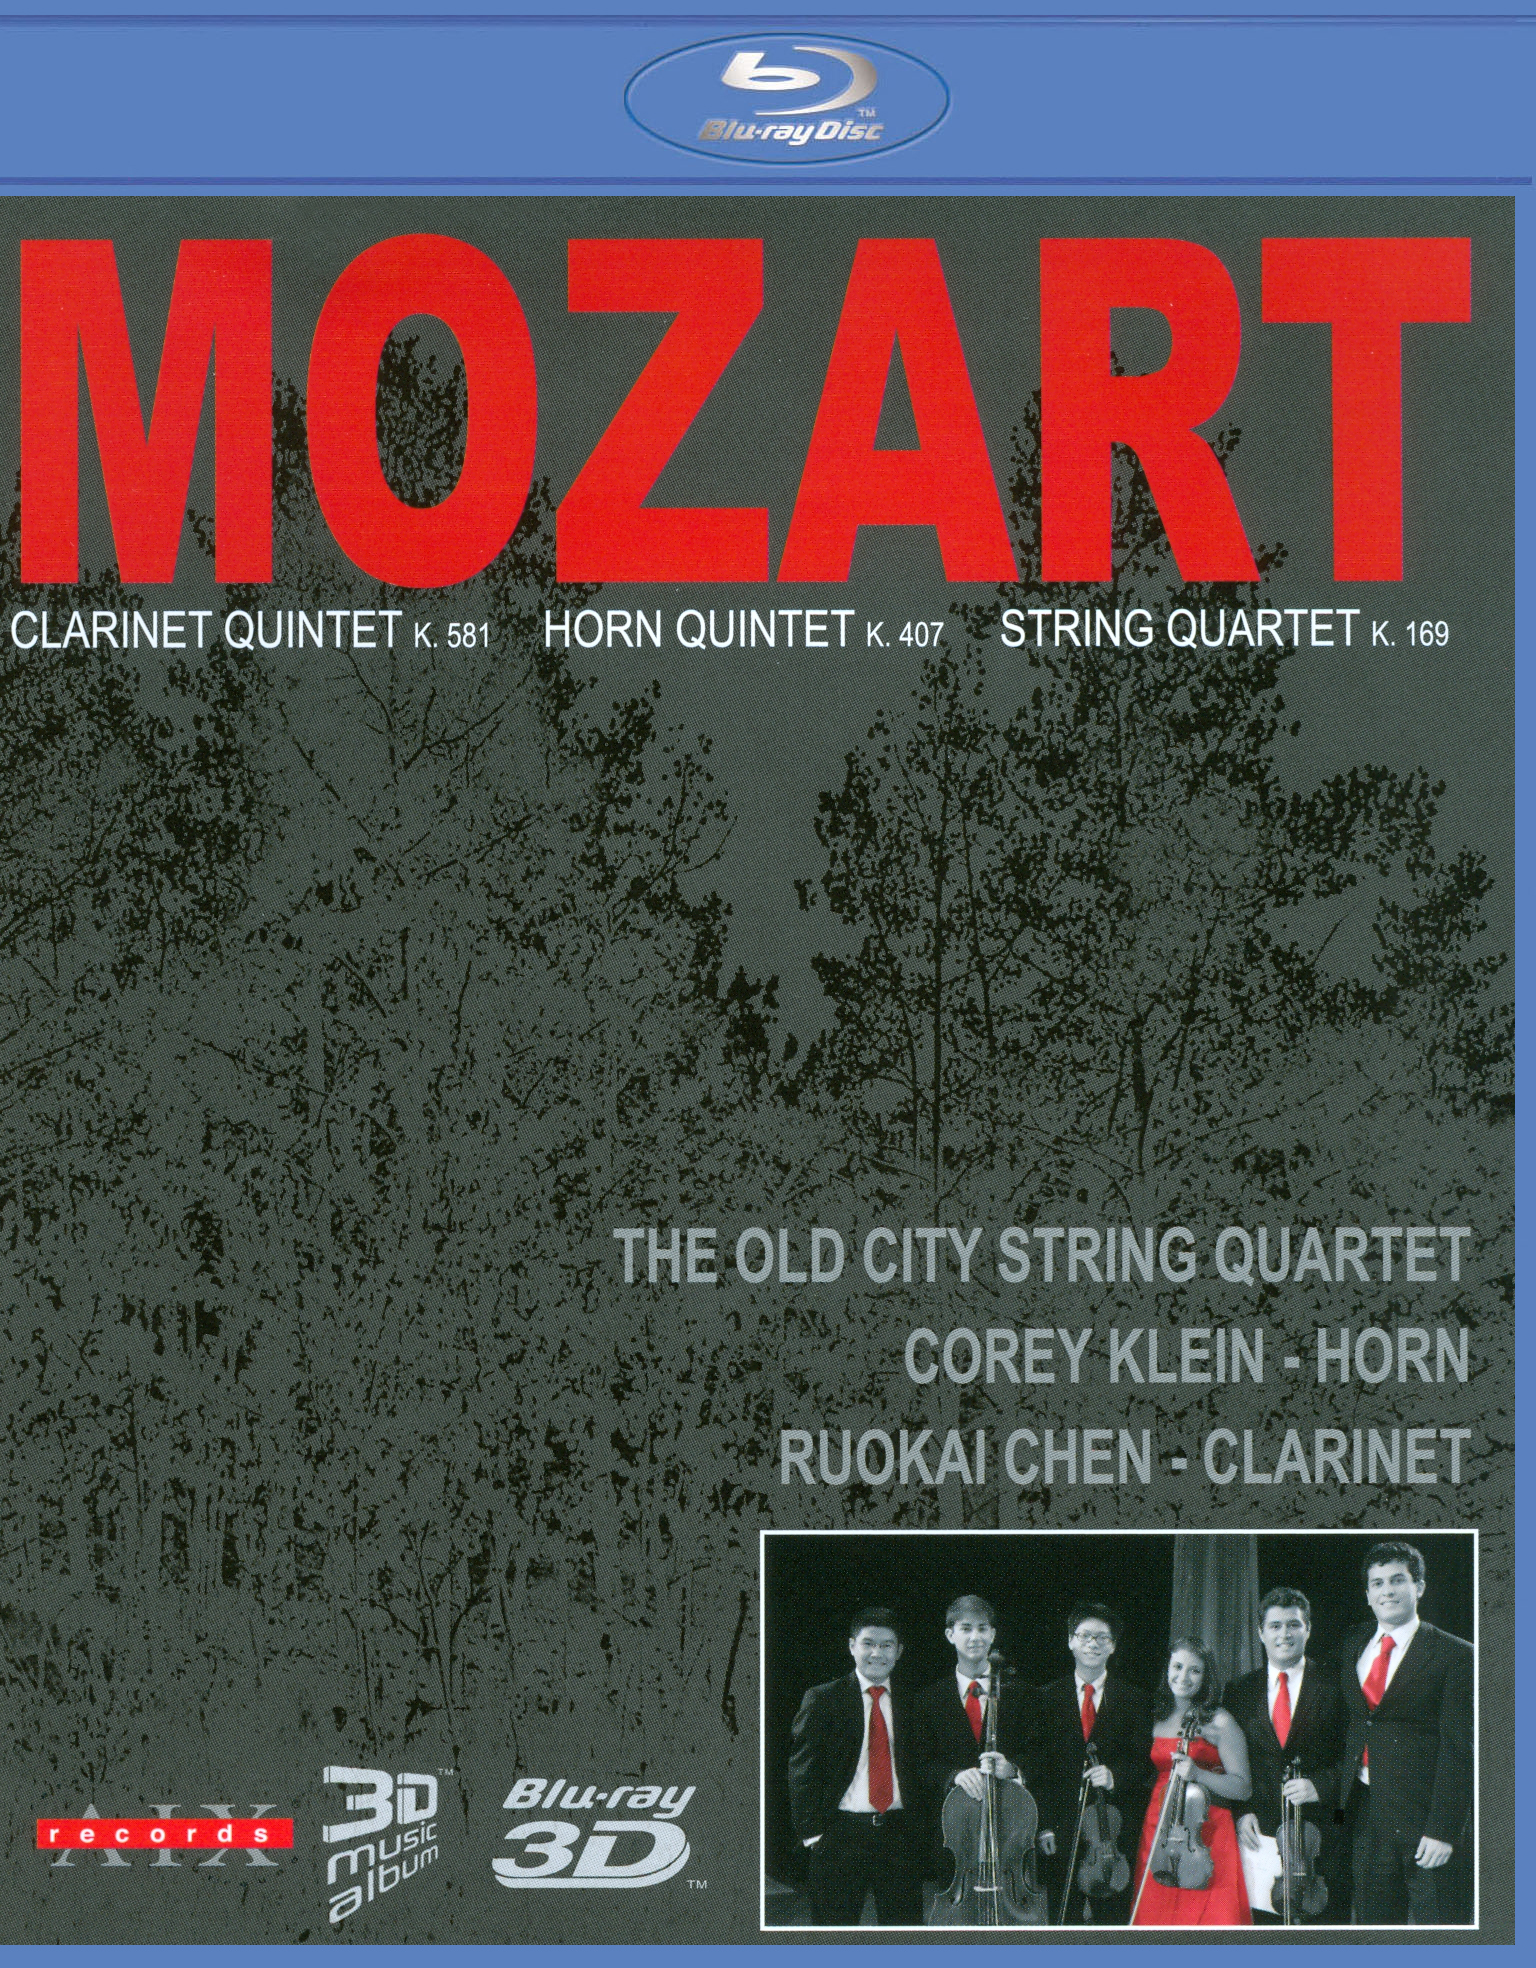 The Old City String Quartet: Mozart - Clarinet Quartet K. 581/Horn Quartet K. 407/String Quartet K. 1